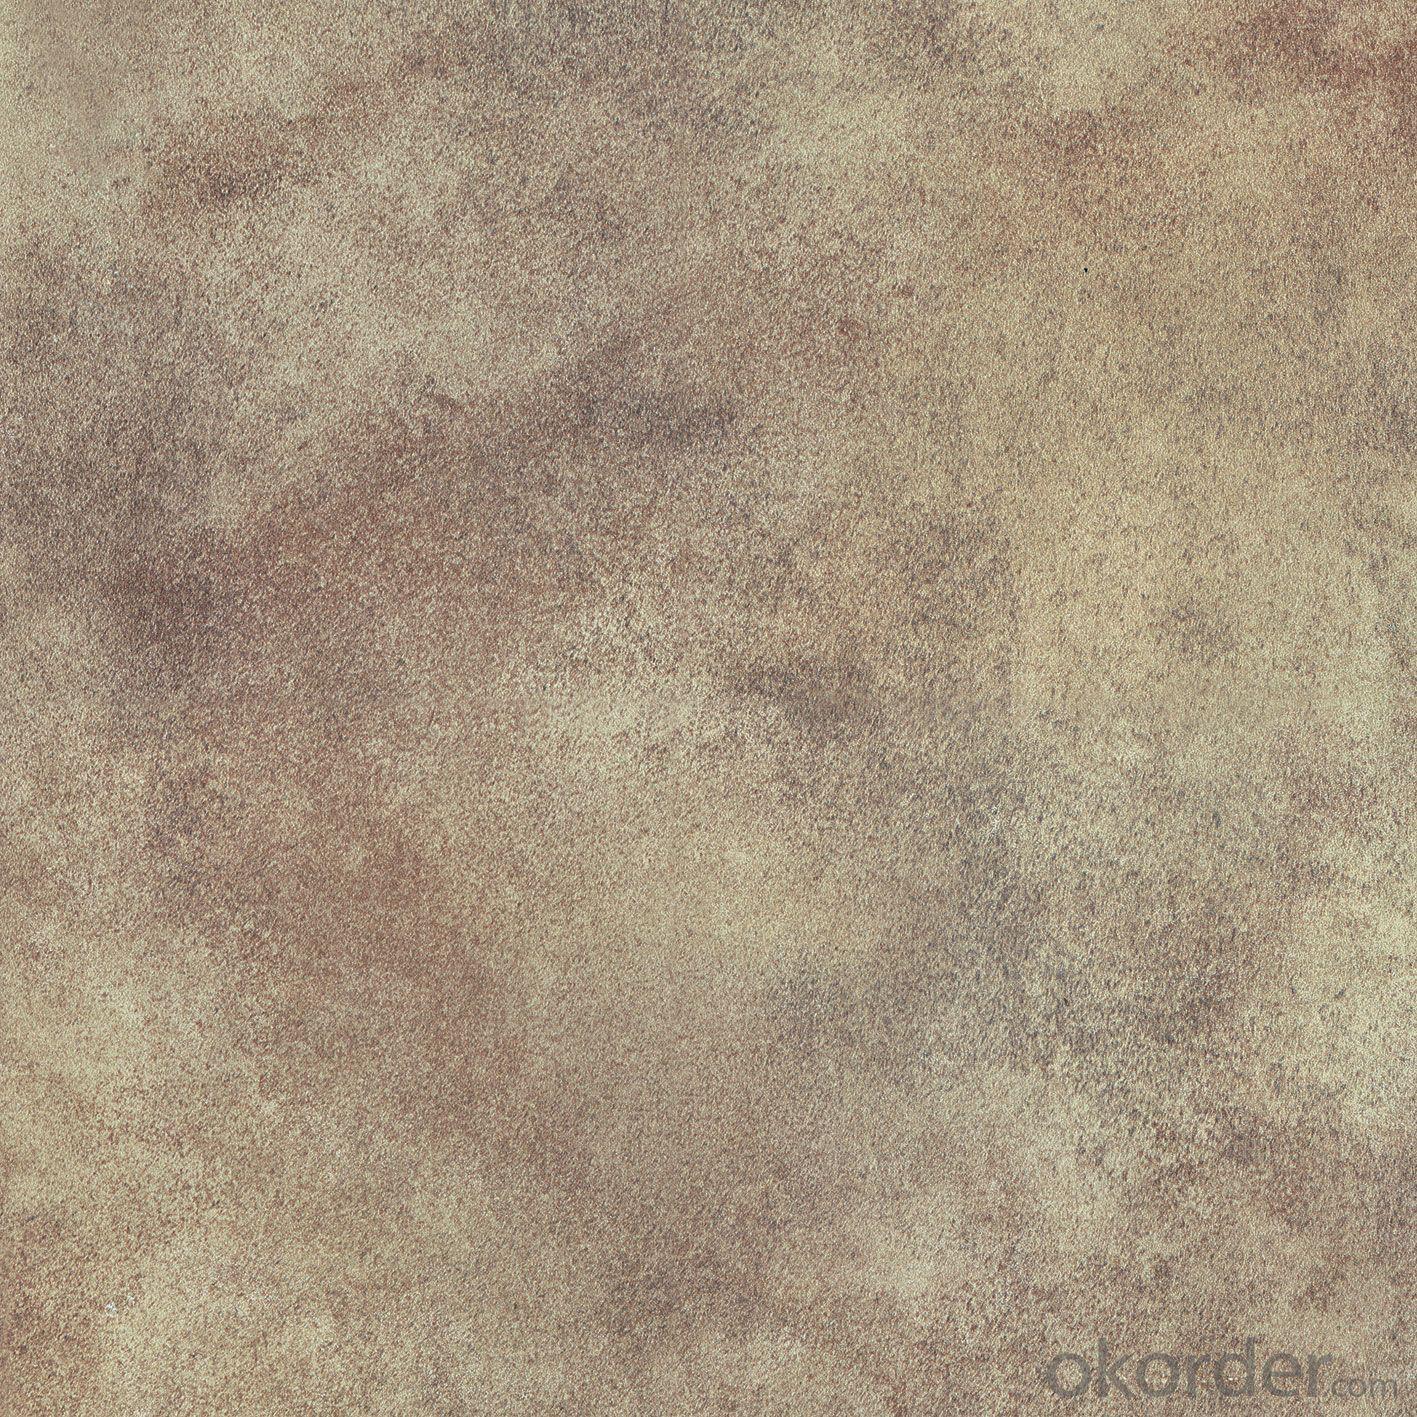 Glazed Porcelain Floor Tile 600x600mm CMAX-LF6005P